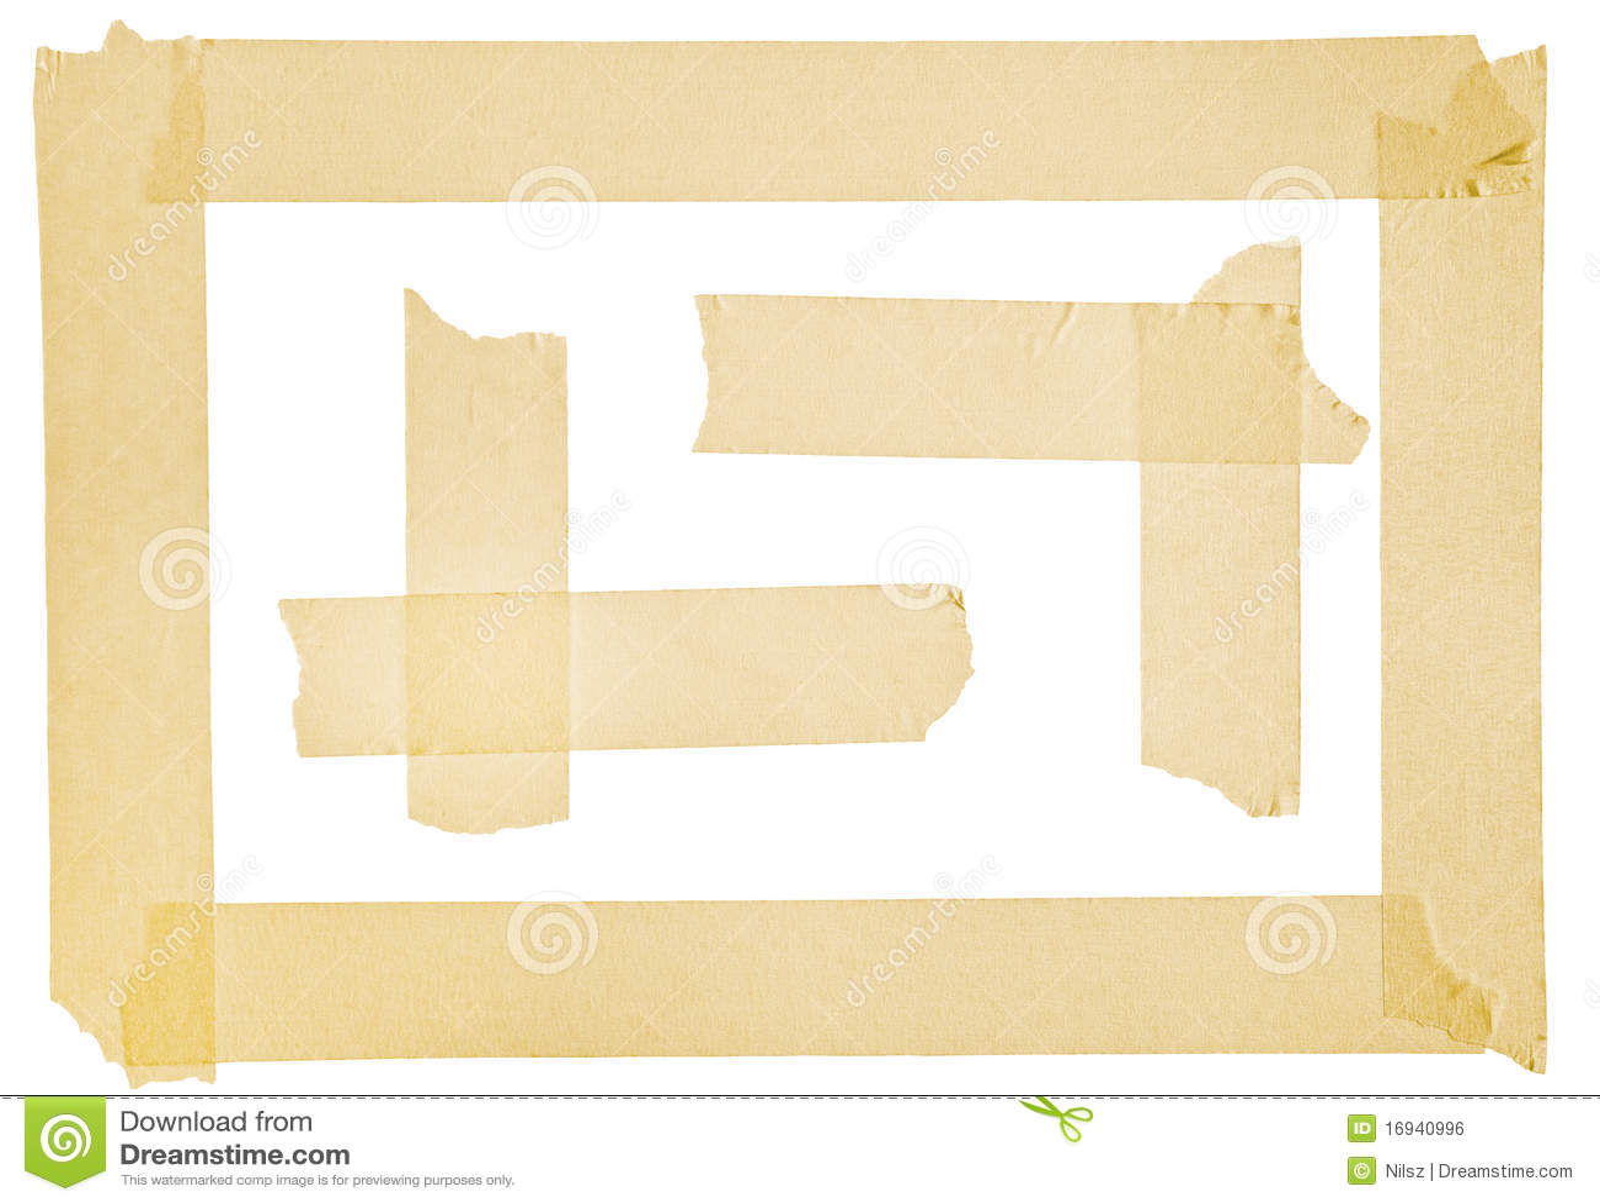 Corner And Border From Masking Tape Stock Photo Image